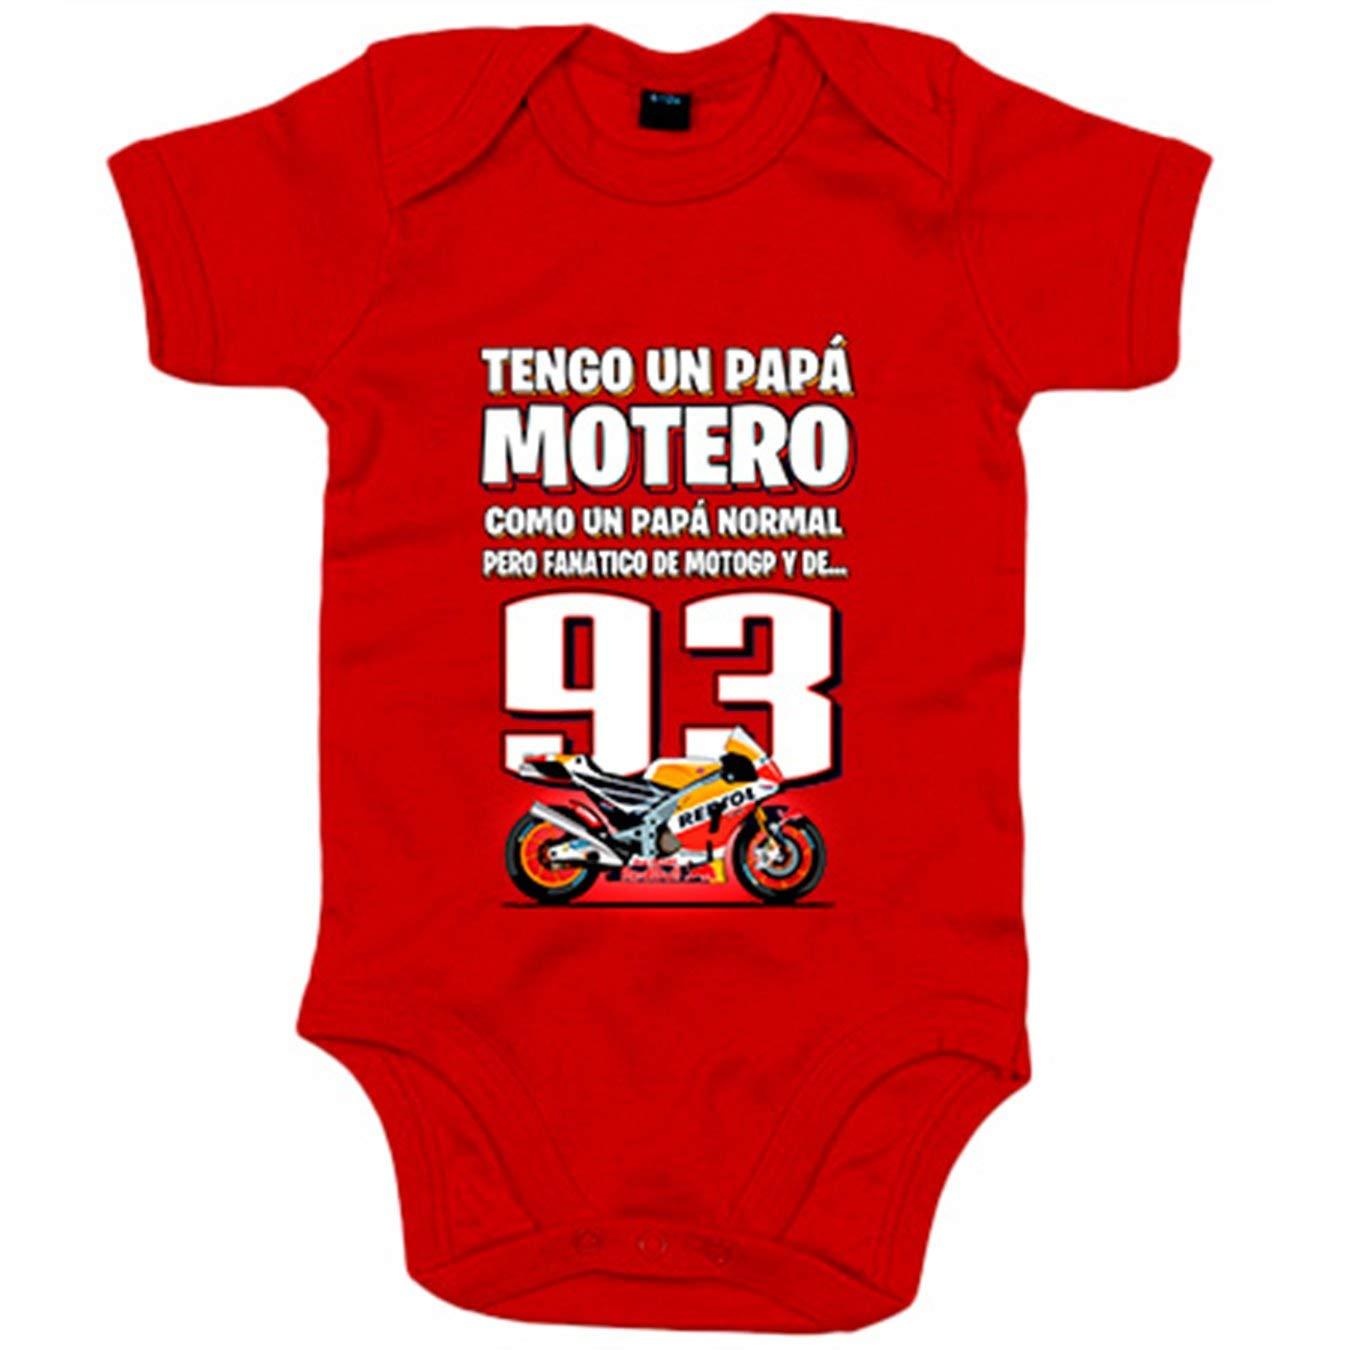 Body bebe Niño Niña 0 3 6 12 meses Comodo Rojo Todo de Rojo Infantil 2019